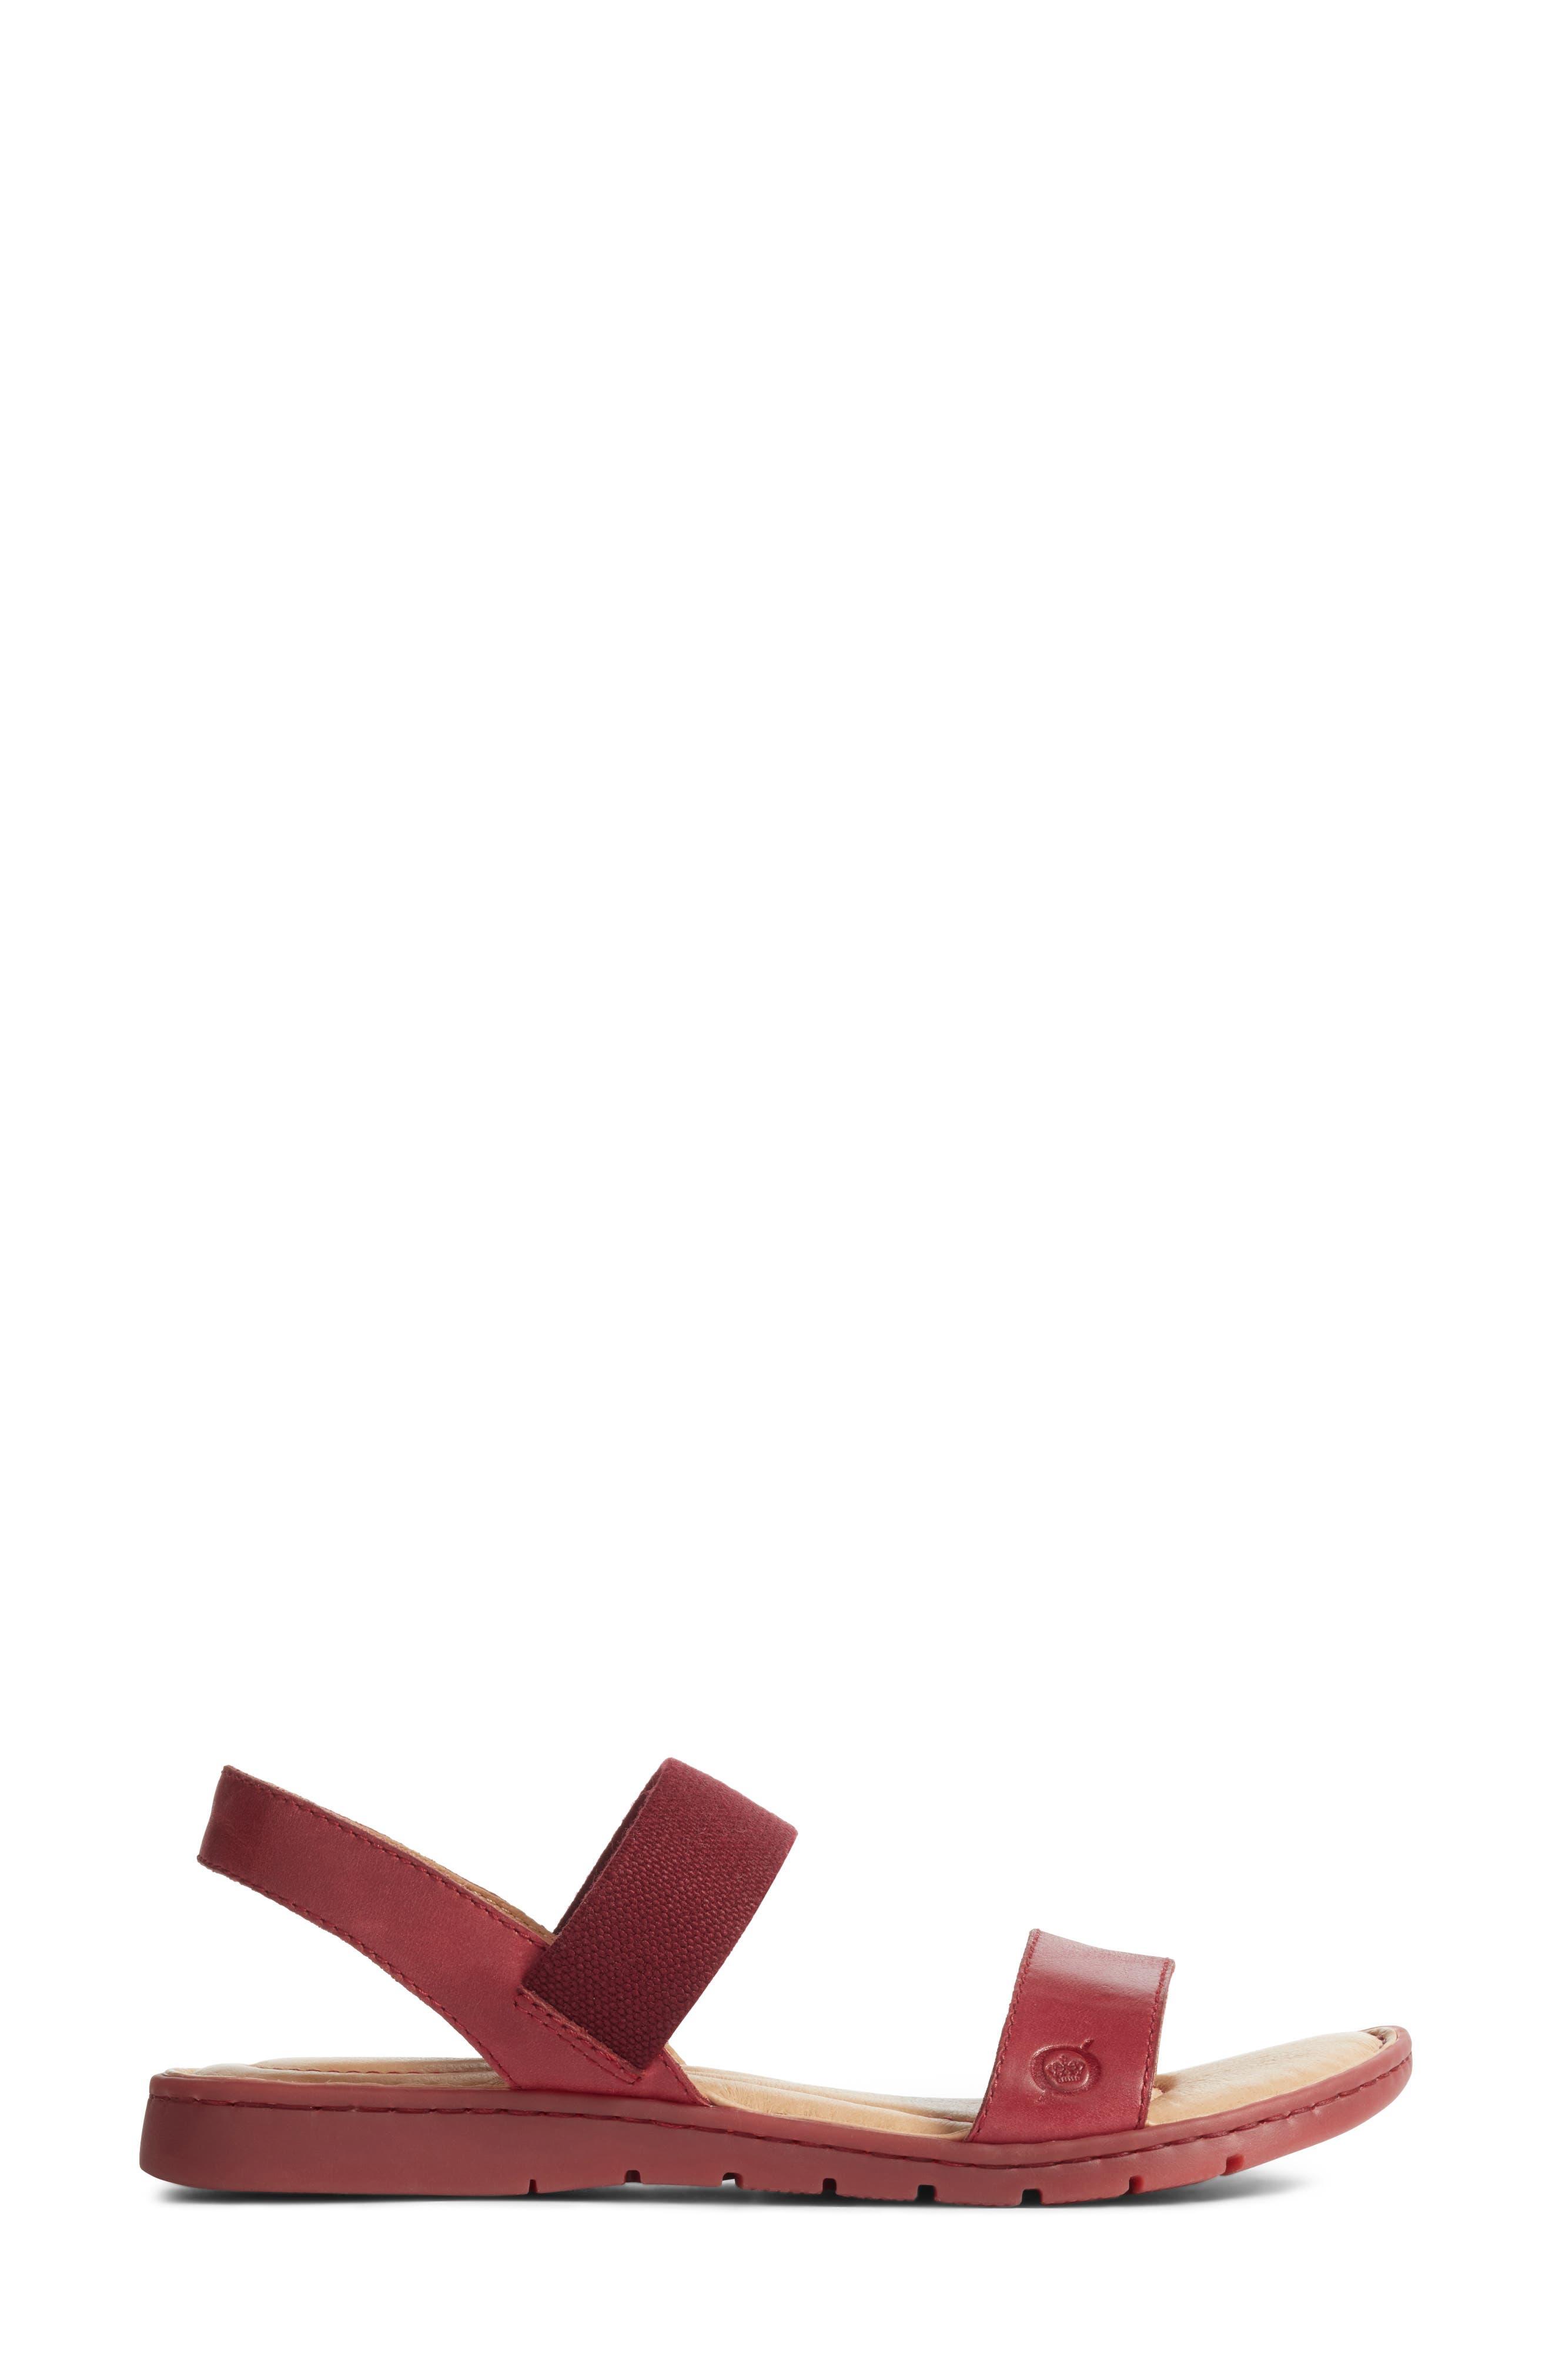 Börn Elstar Sandal,                             Alternate thumbnail 3, color,                             Red Leather